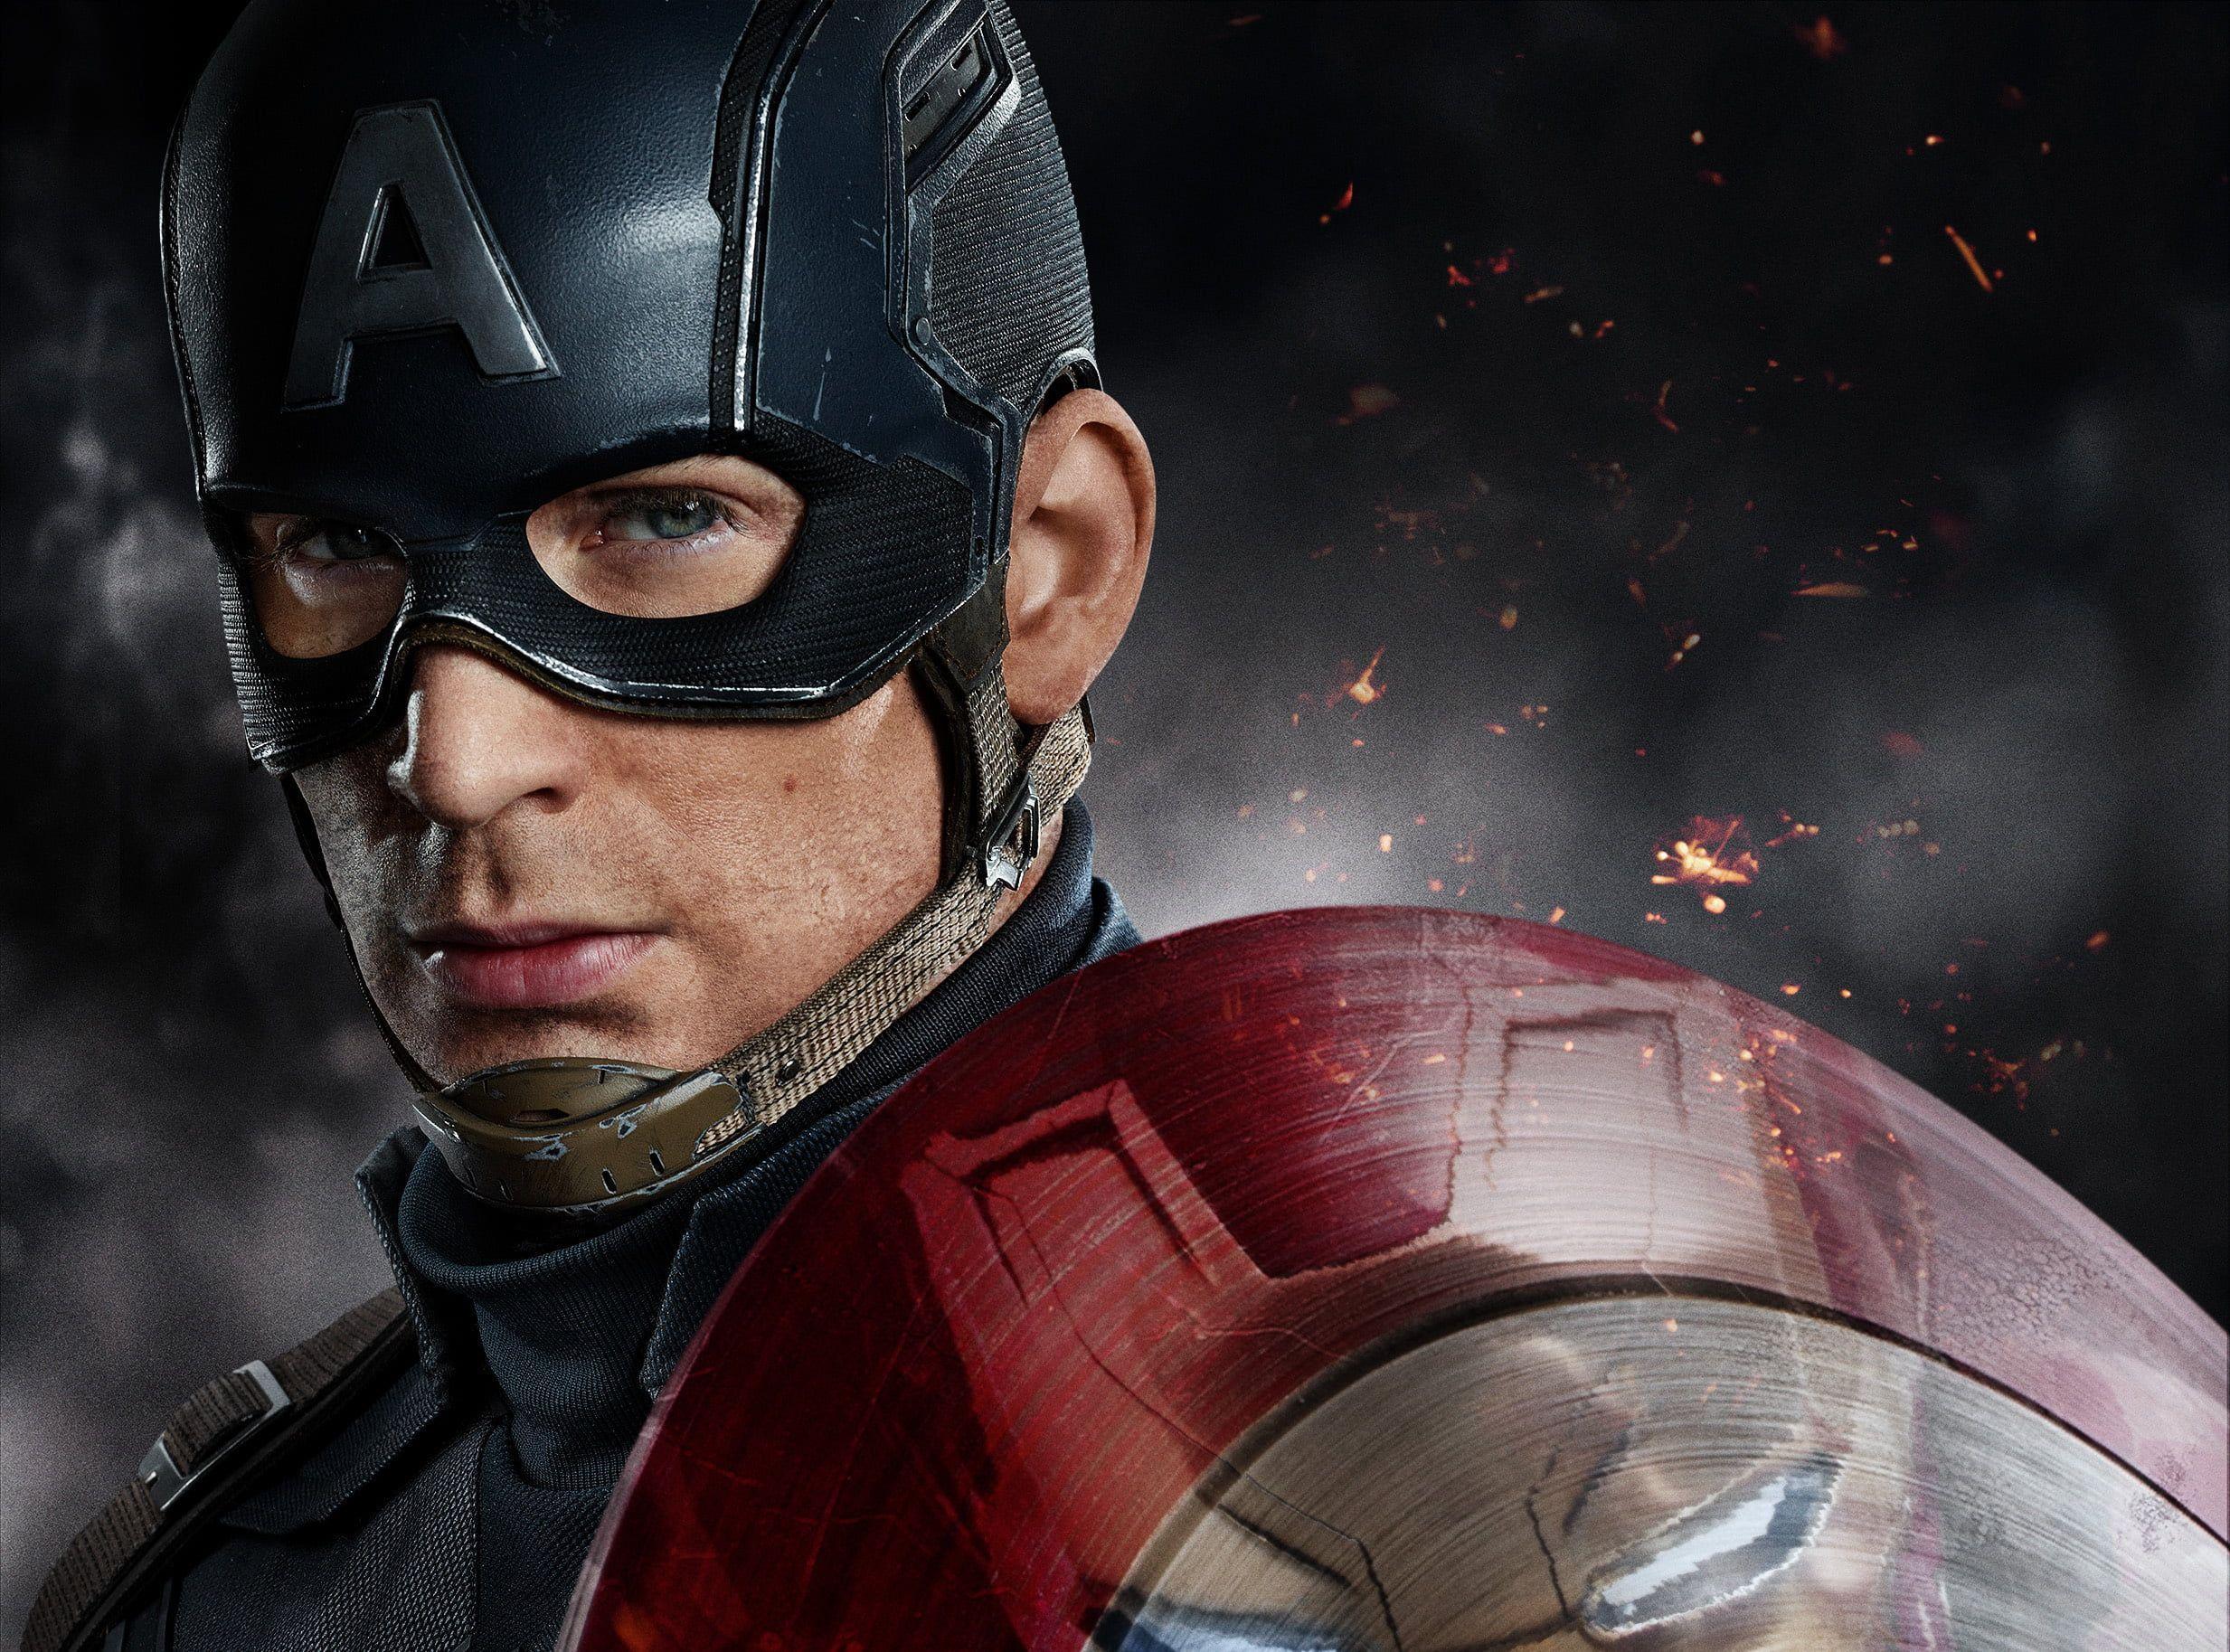 Ww2 Captain America Wallpapers Top Free Ww2 Captain America